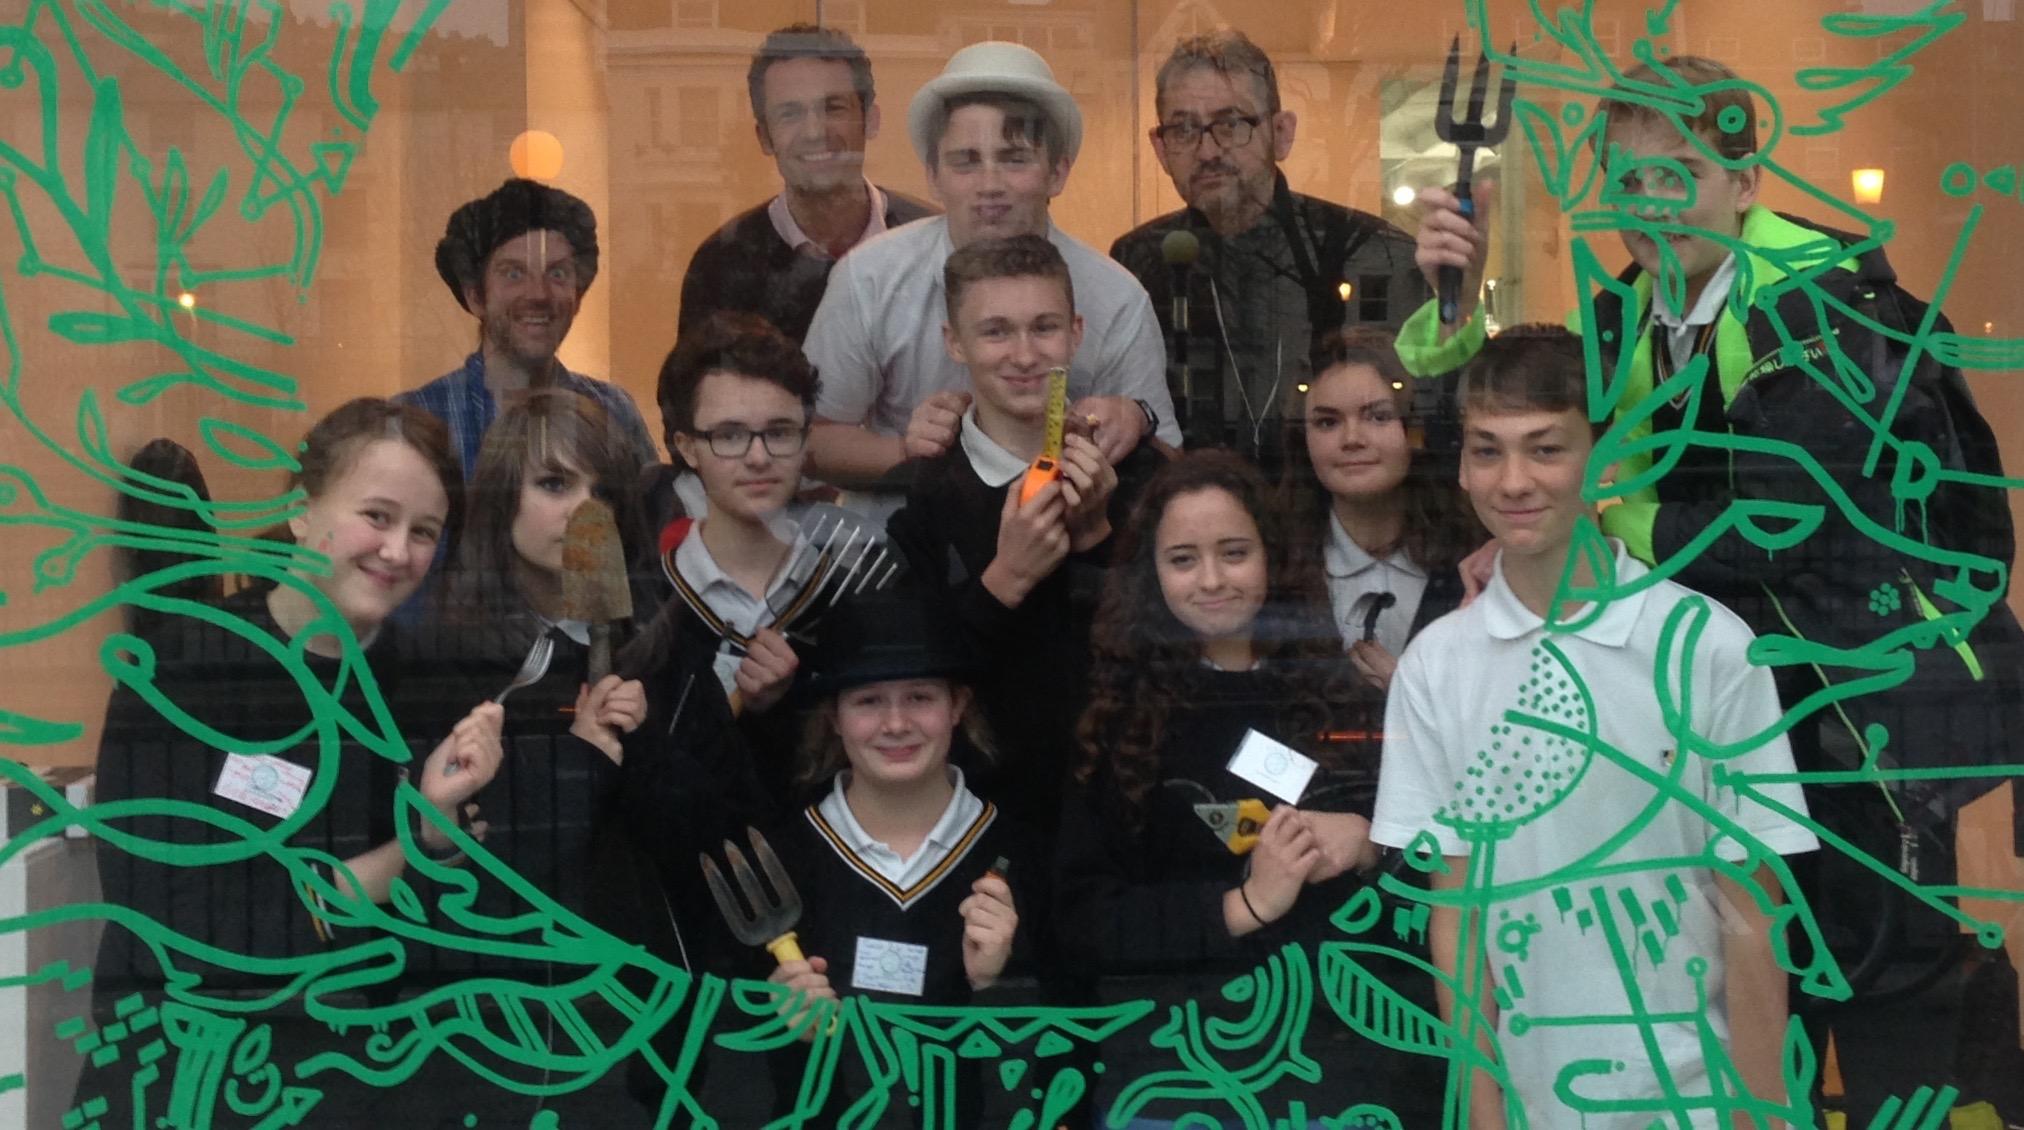 FutureCoast Youth team